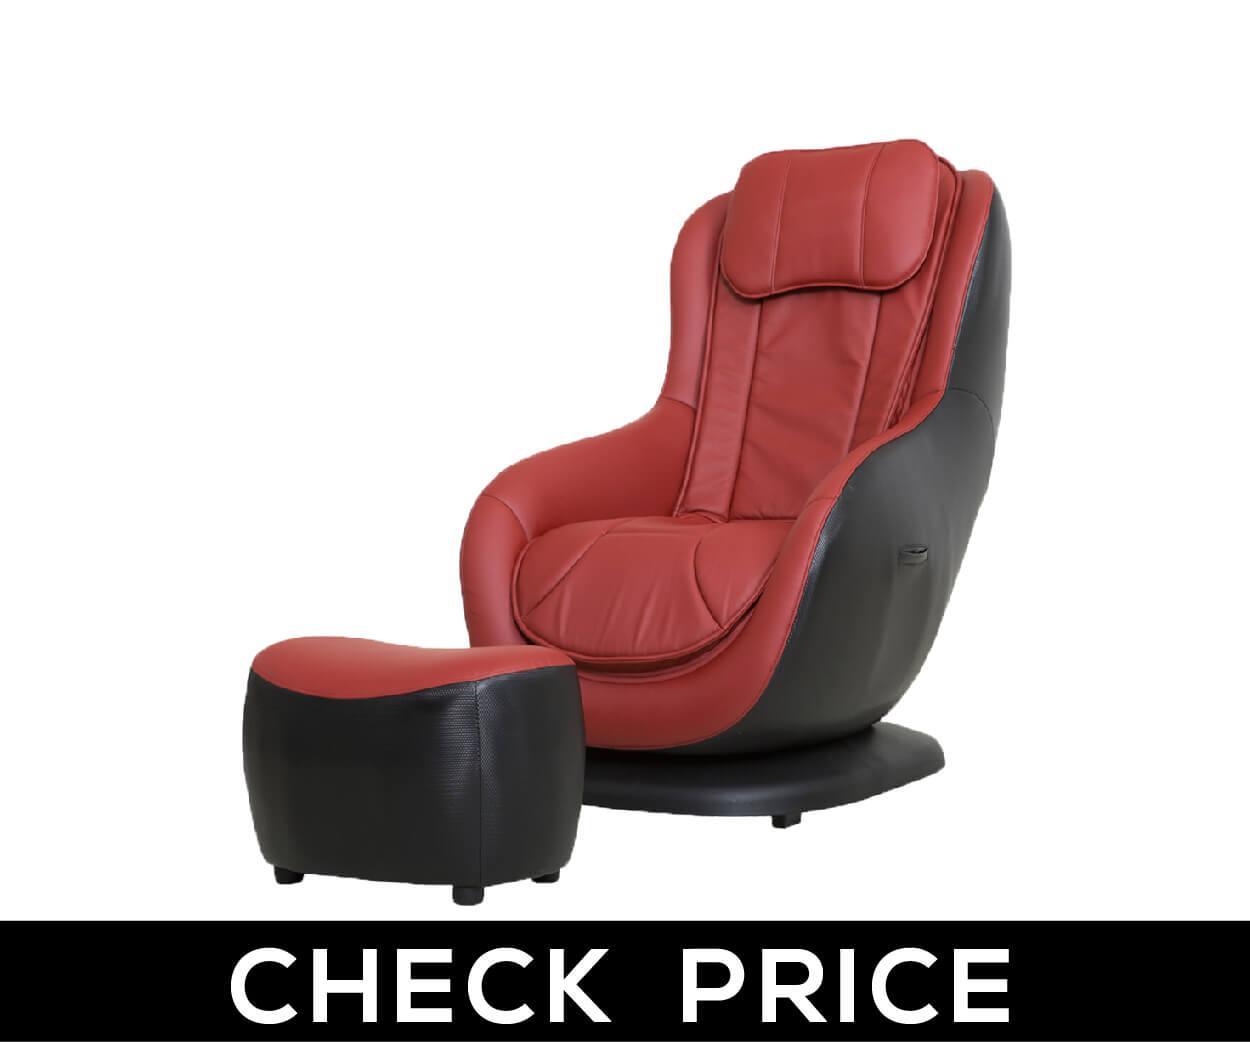 Kahuna Massage Chair L-Track Compact Hani-3200